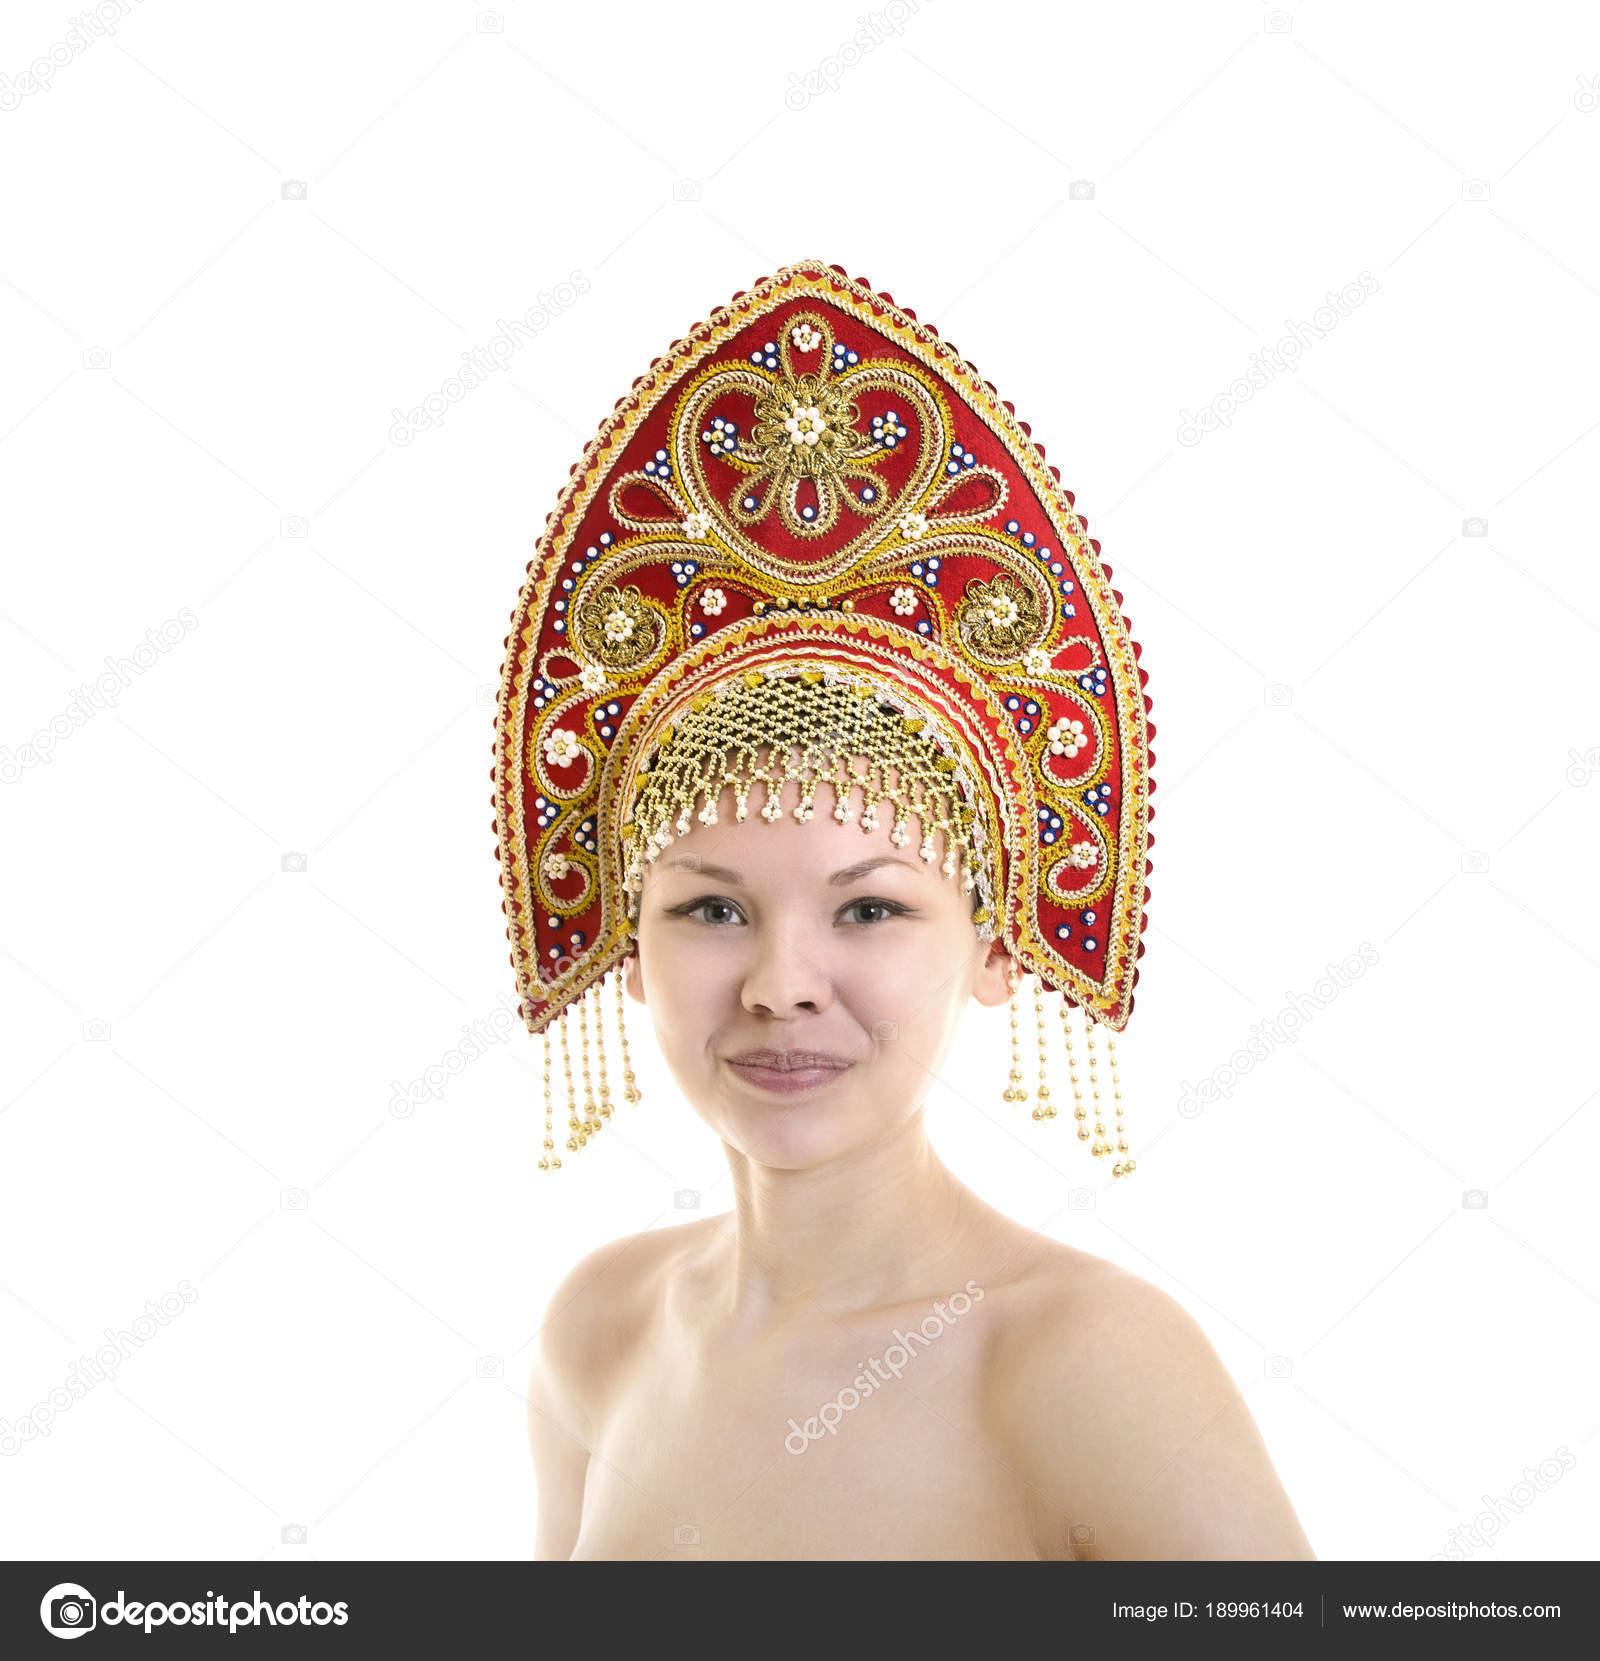 Nude indian girl in headdress